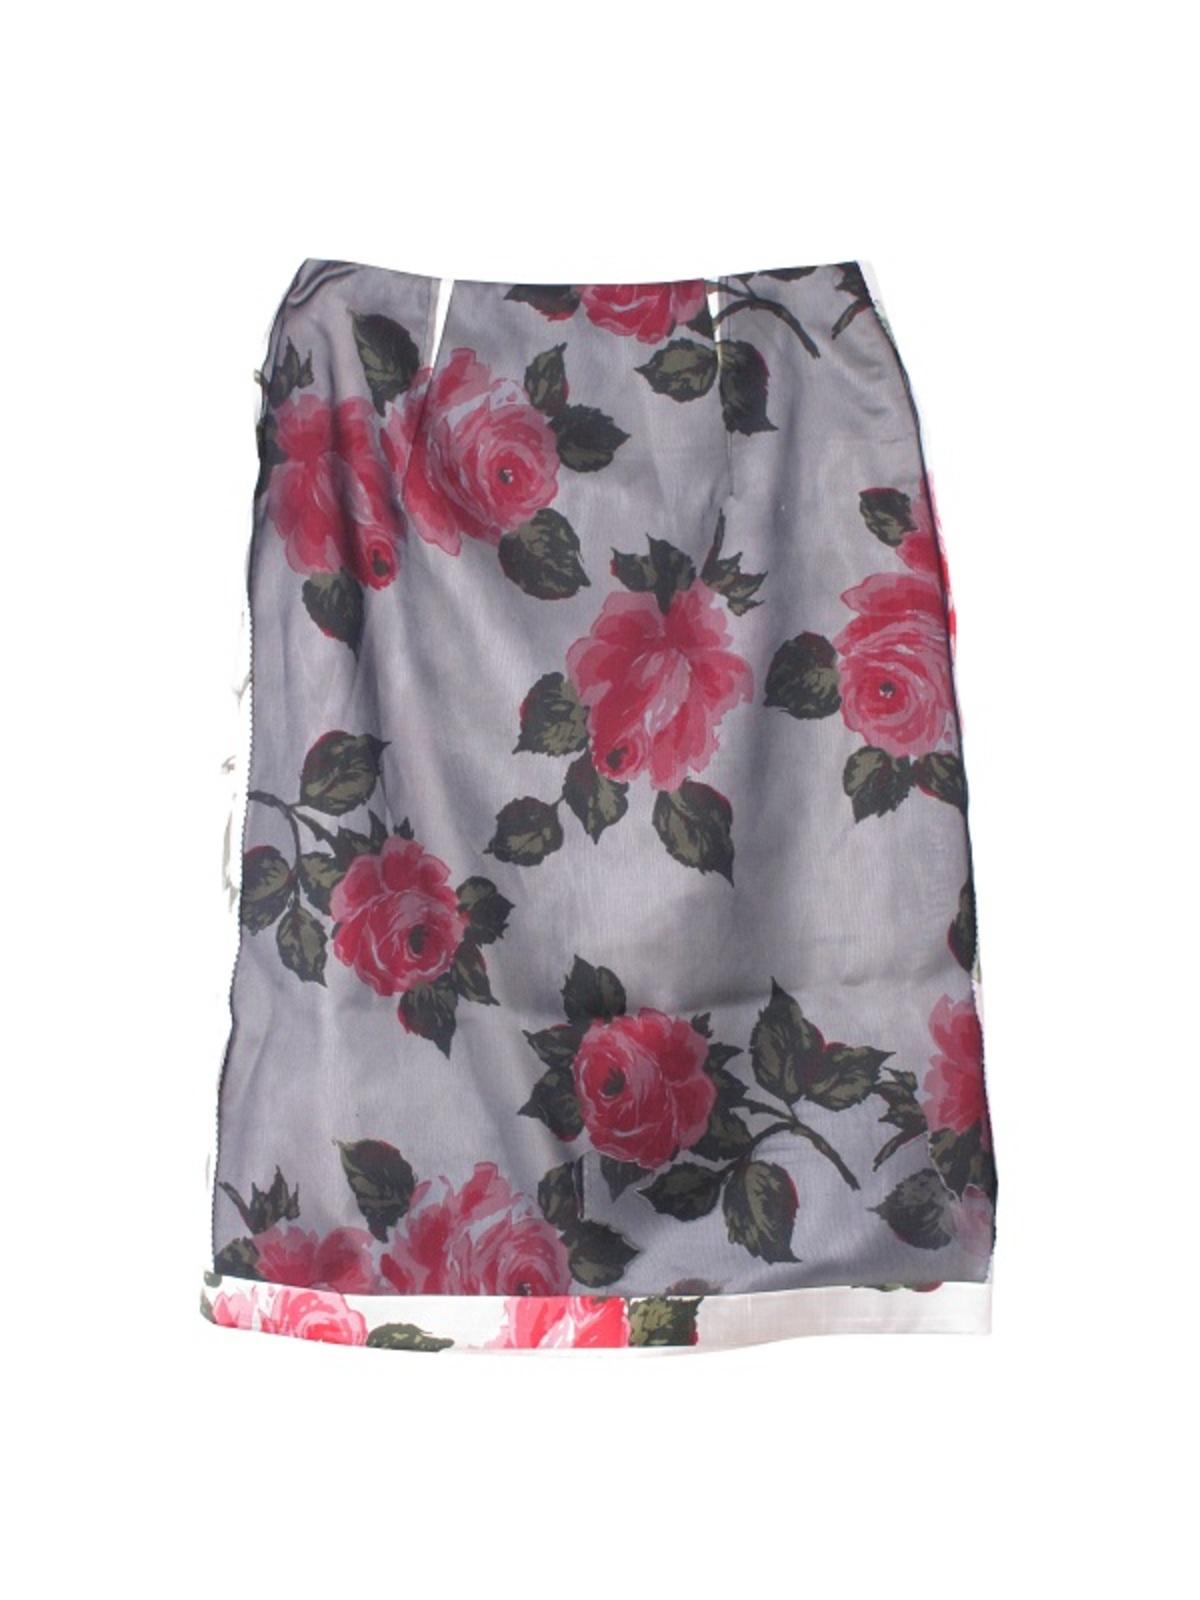 72bb271a64c1 Maison Margiela Organza Printed Flower Skirt - Black/White | Garmentory